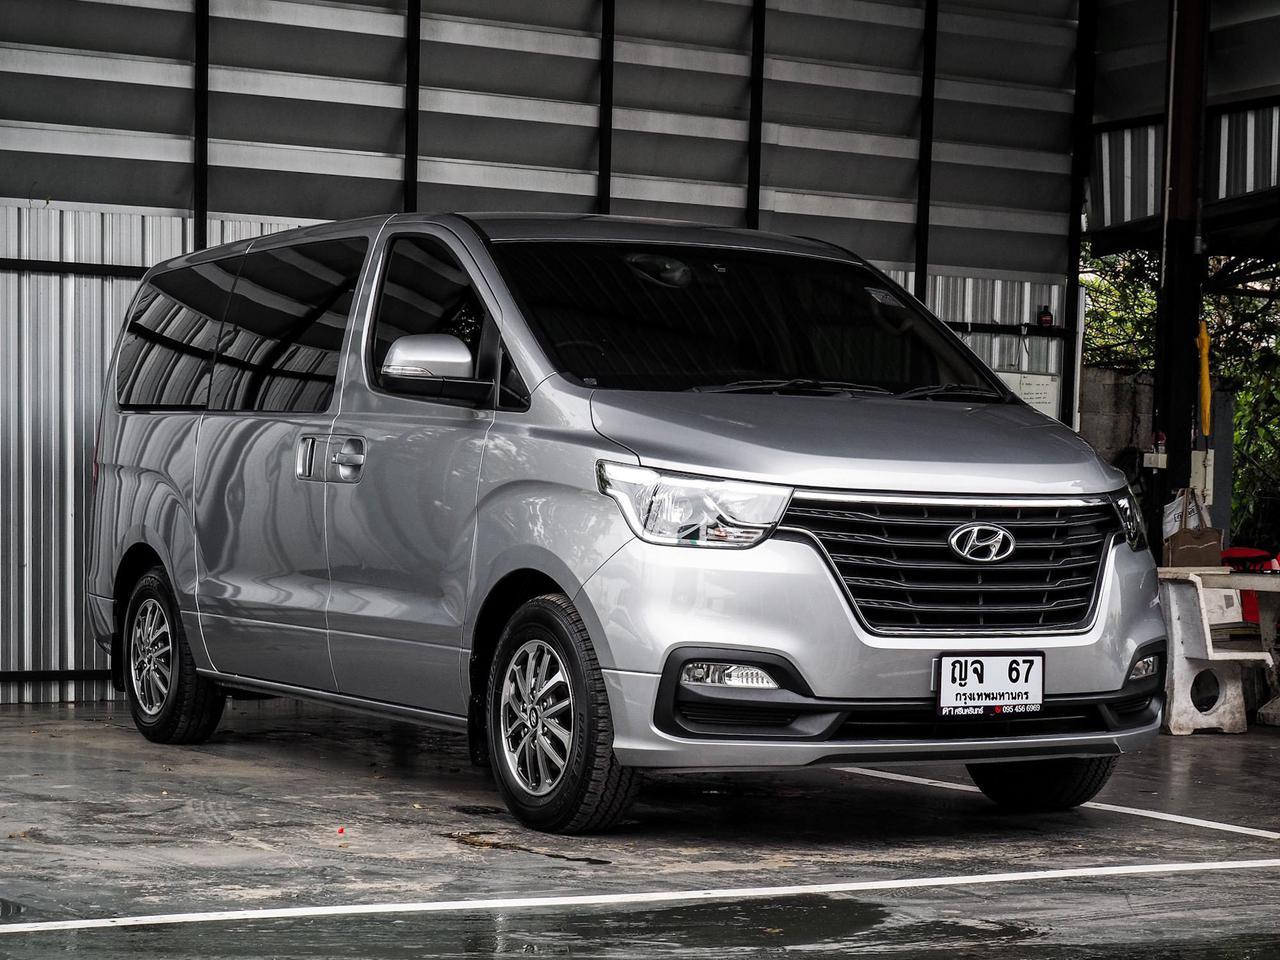 Hyundai H1 Touring โฉมปัจจุบัน ปี 2019 เลขไมล์ 30,000 กิโล รูปที่ 1